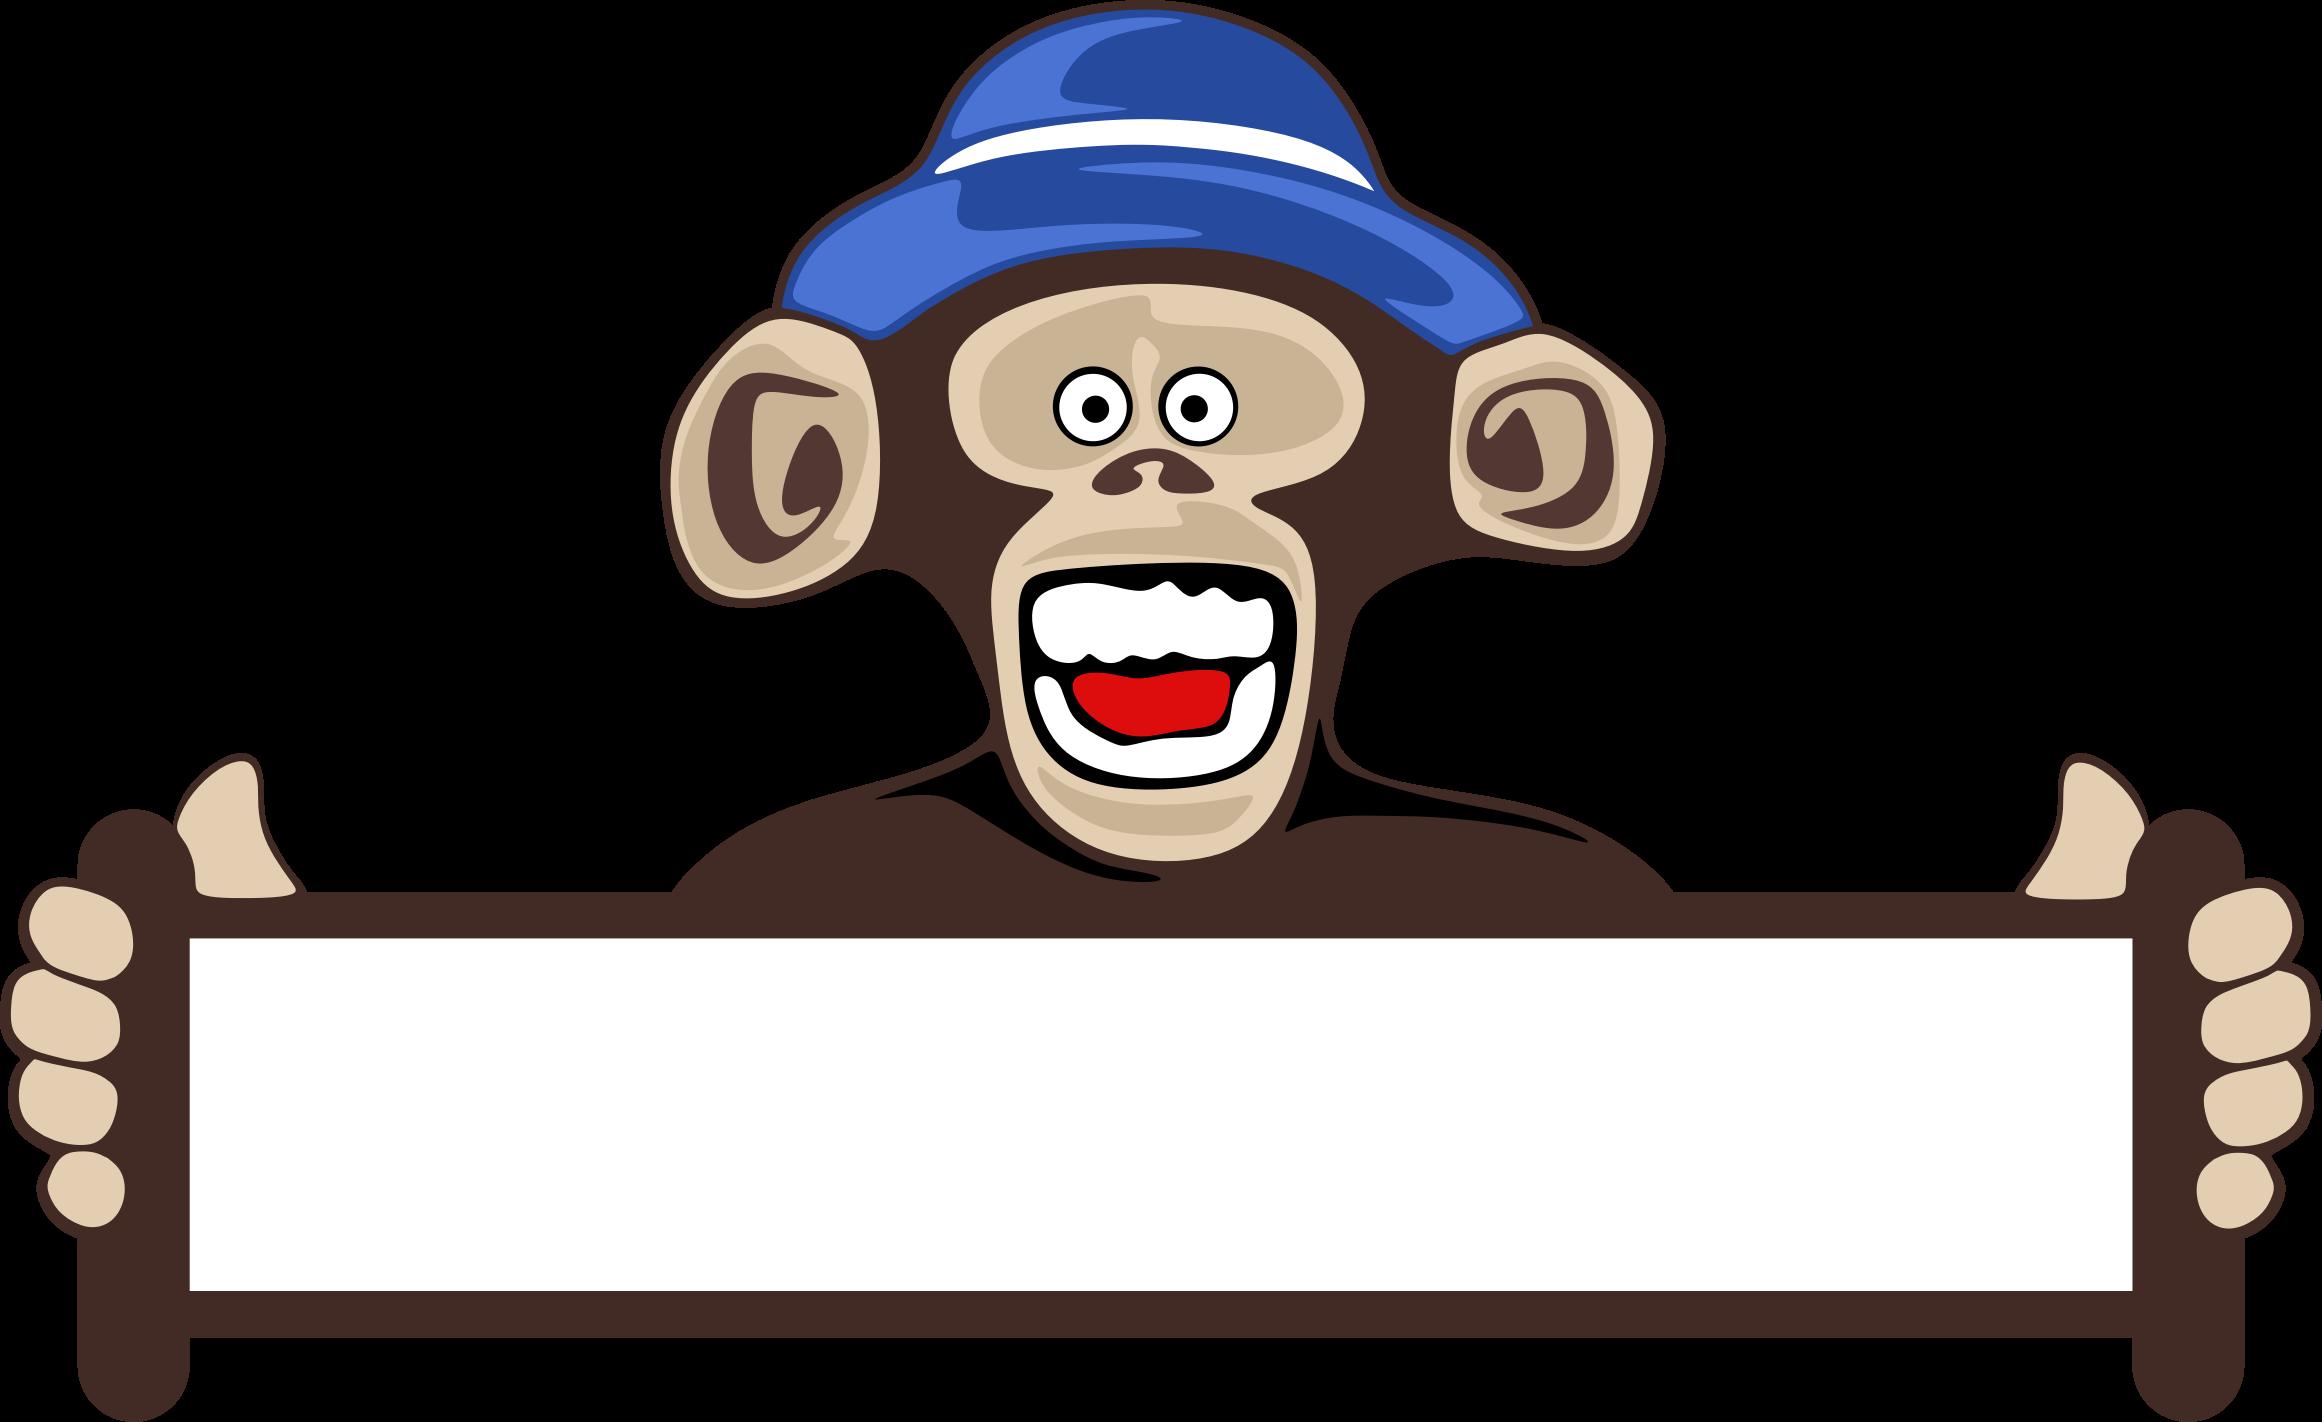 transparent stock Monkey holding blank sign. Ape clipart svg